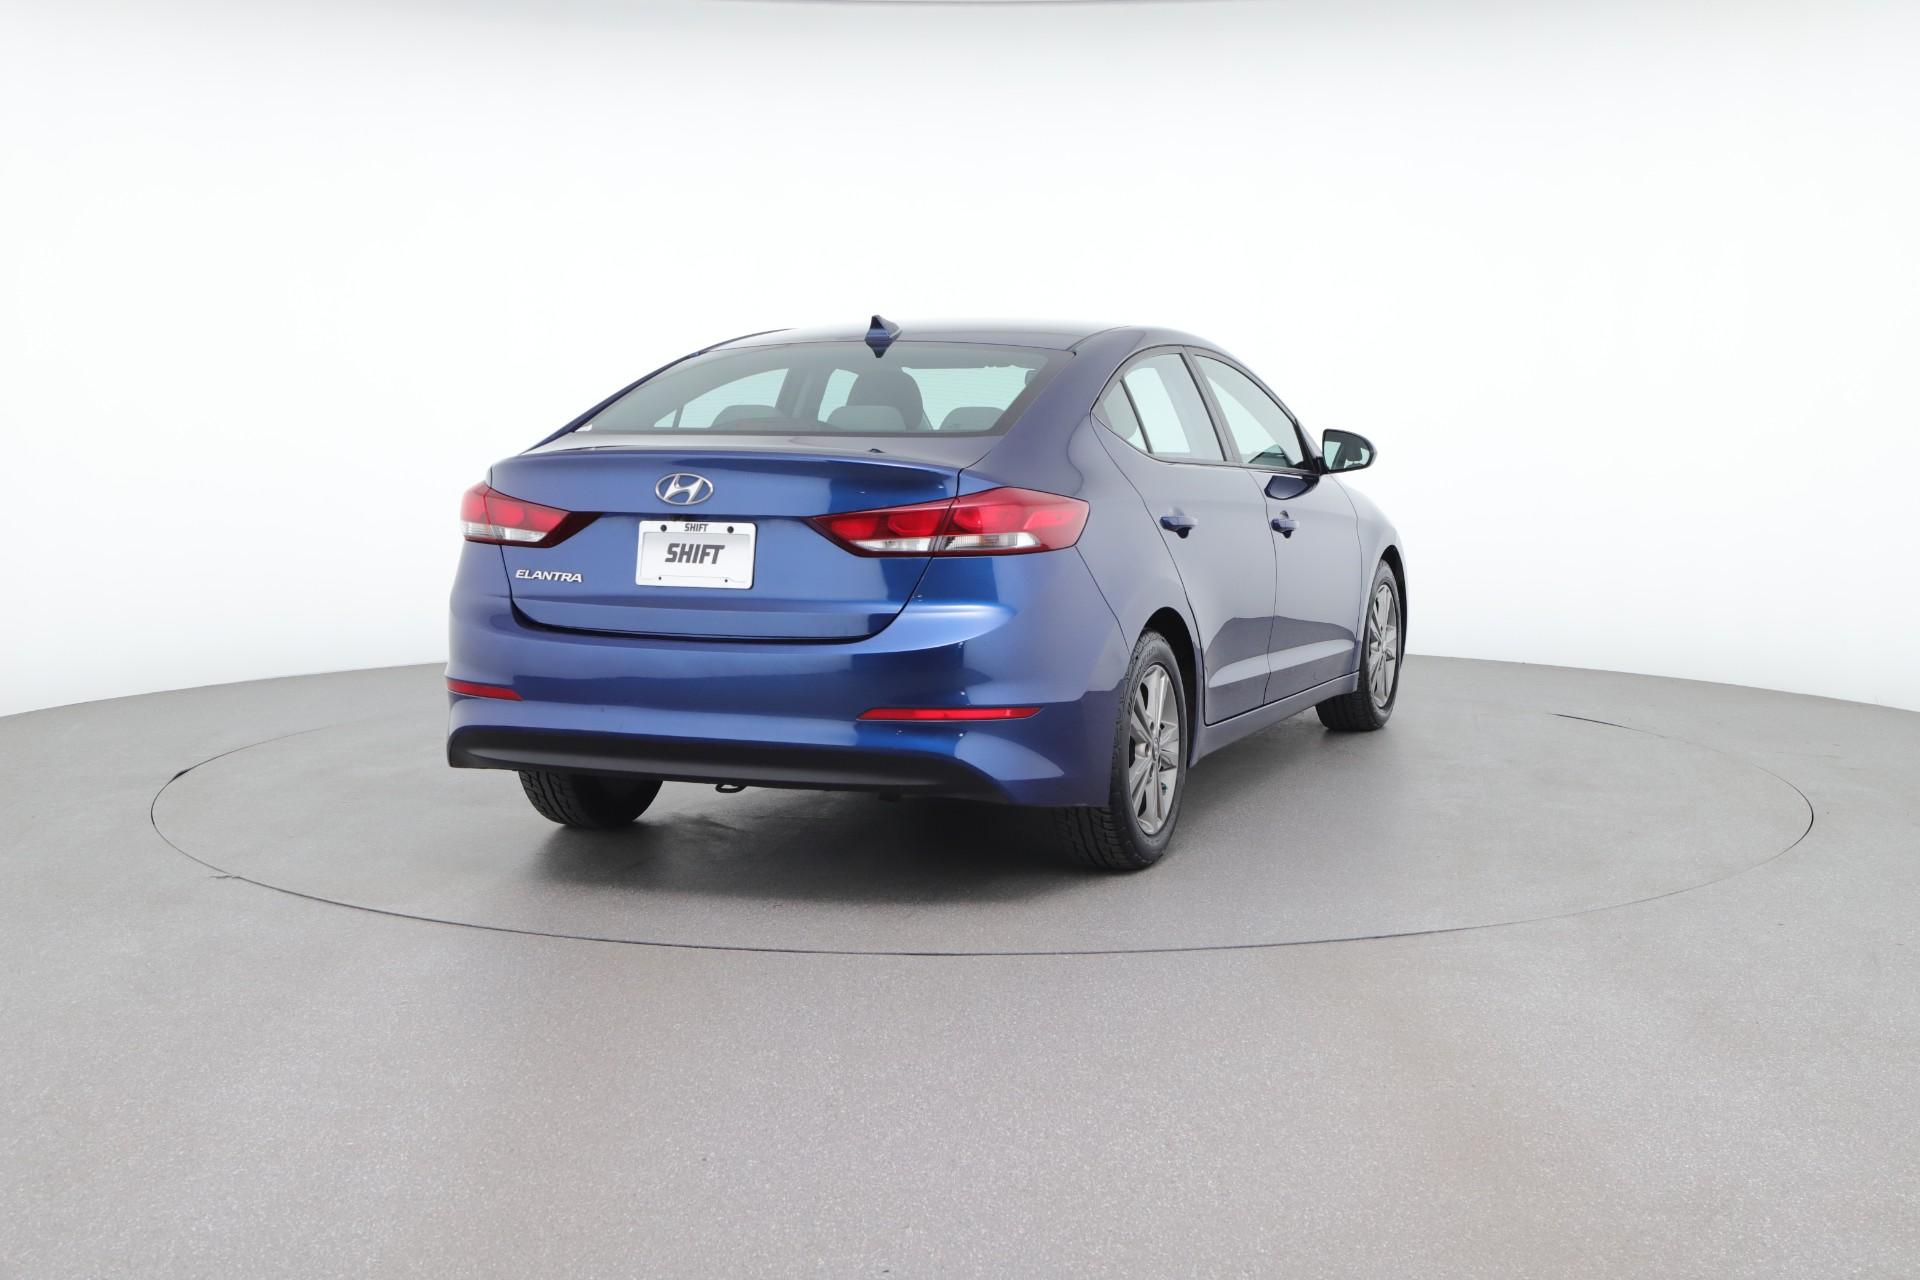 2017 Hyundai Elantra SE (from $12,750)